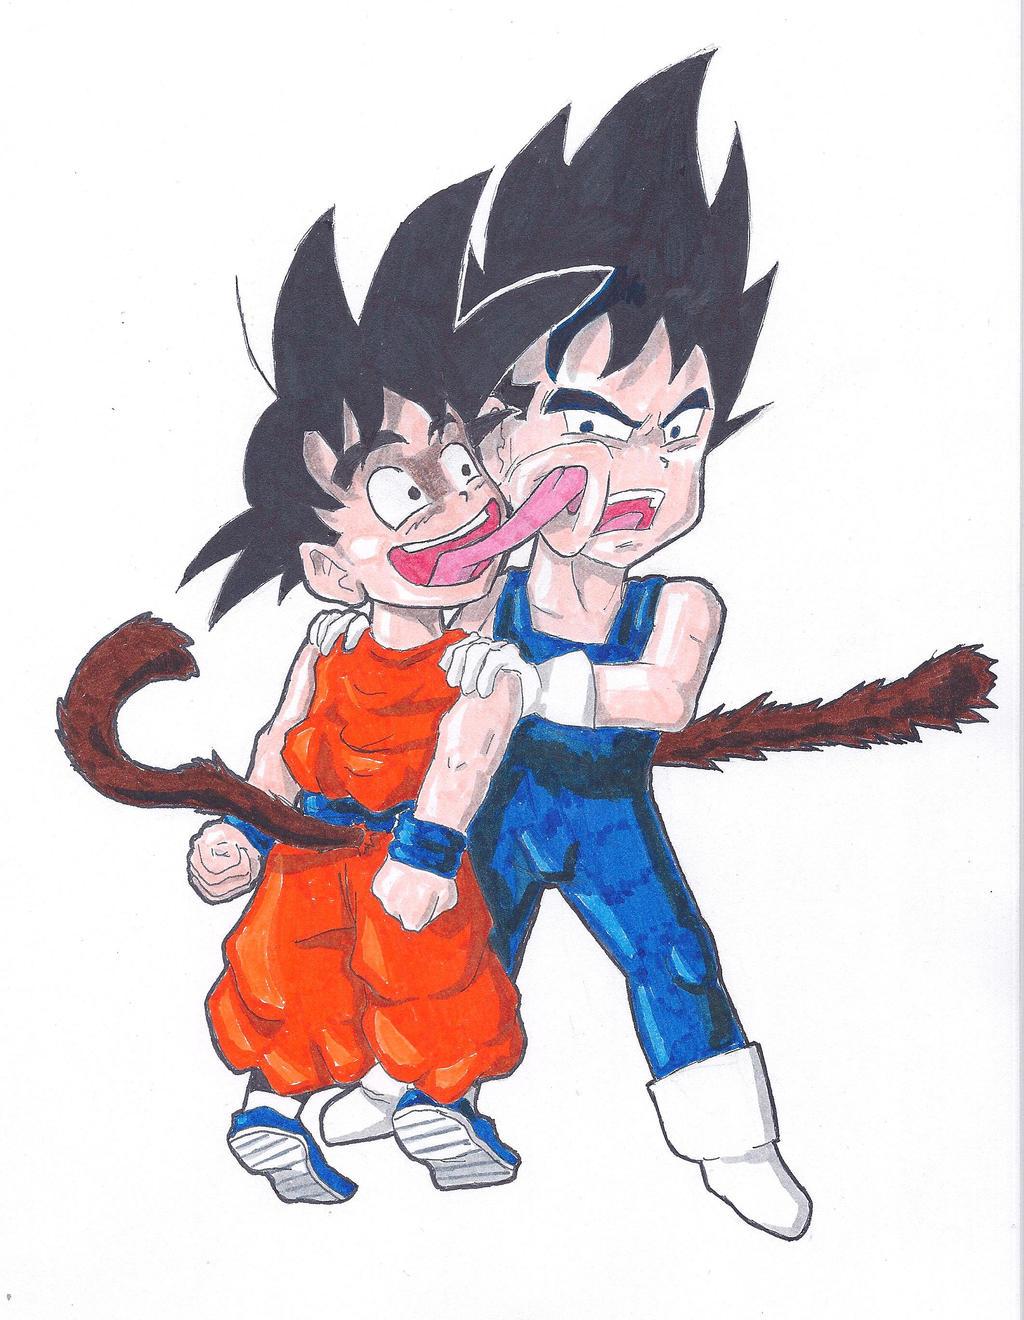 Kid Goku And Kid Vegeta Kid Goku Says Hi to Ki...